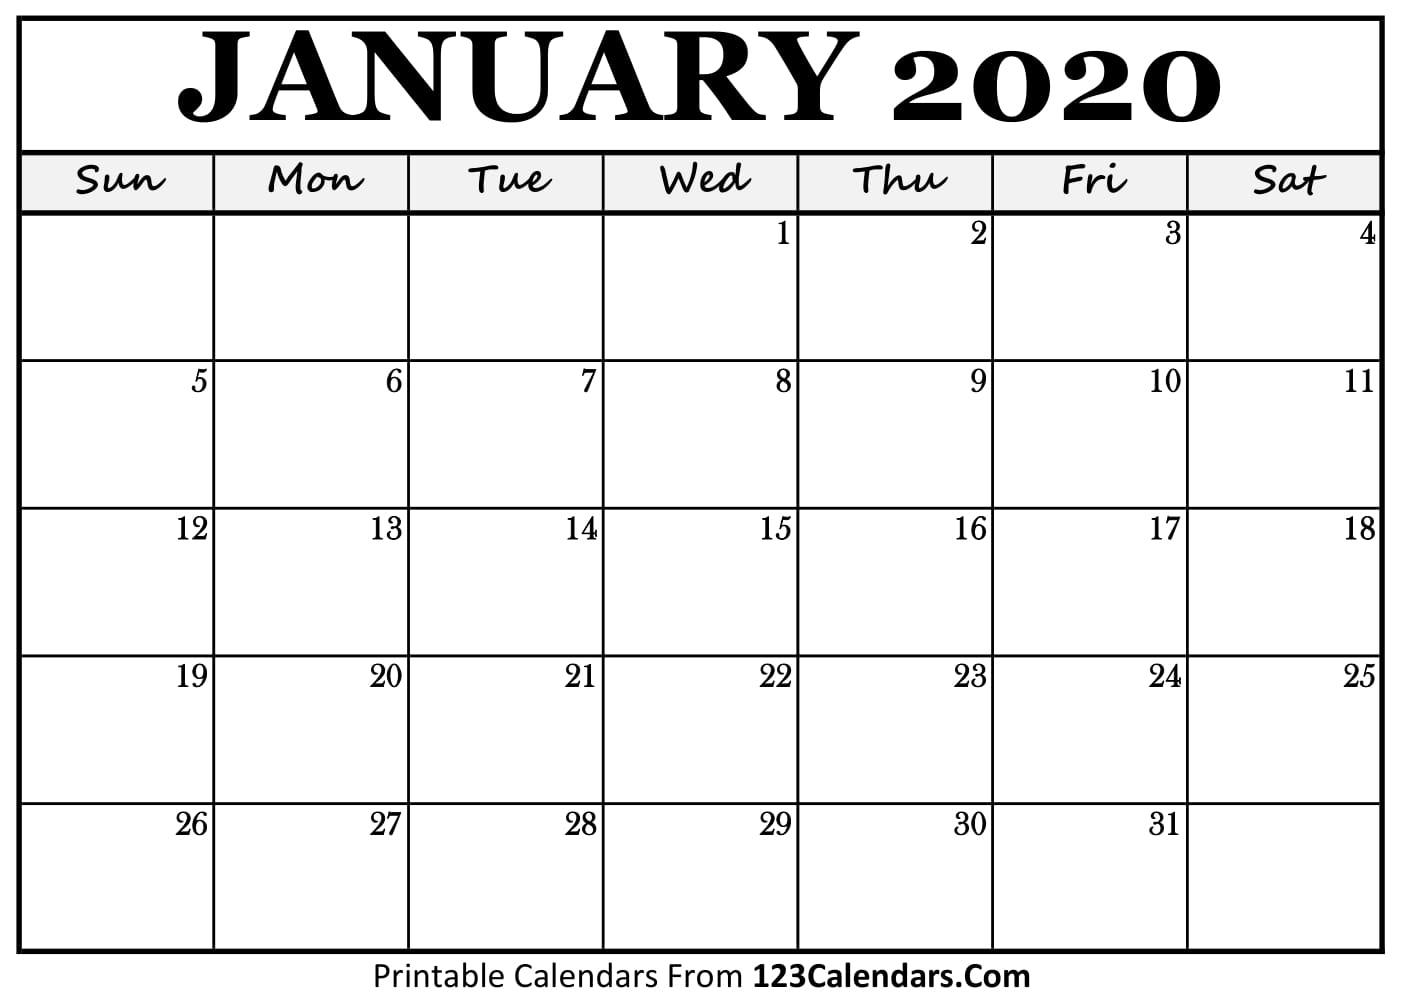 014 January Calendar Template Ideas Blank Striking Printable